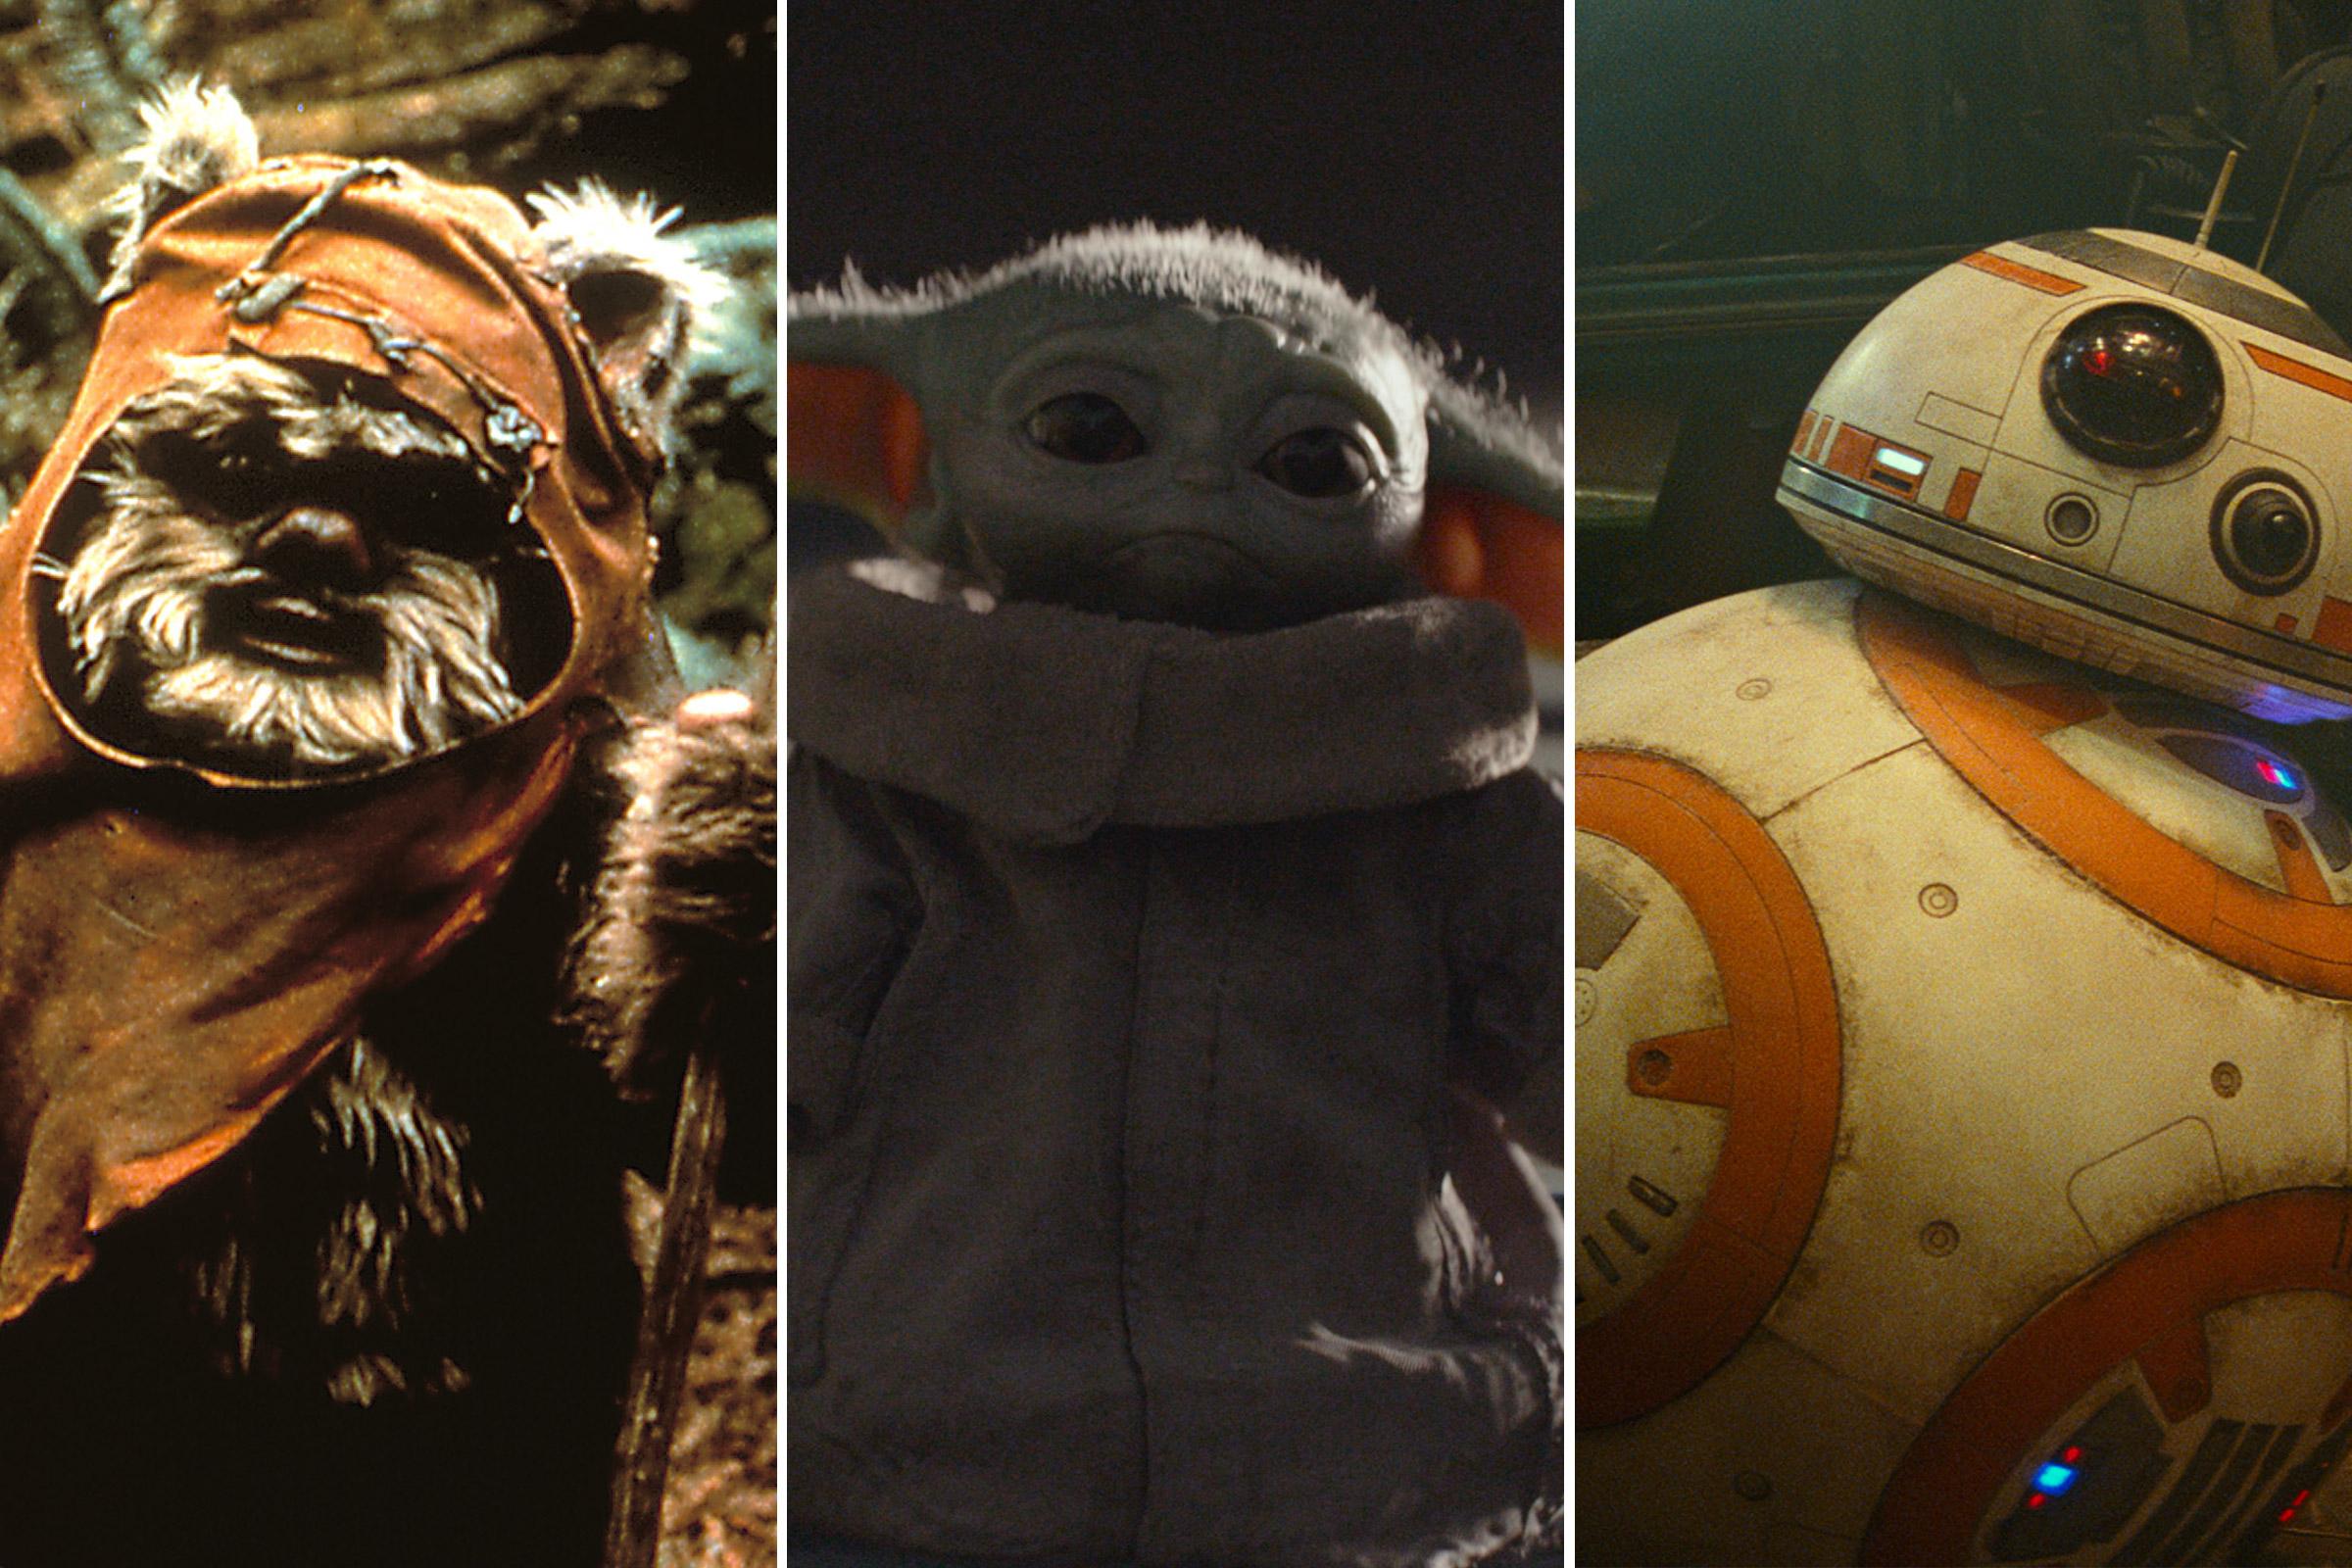 An Ewok, Baby Yoda, BB8